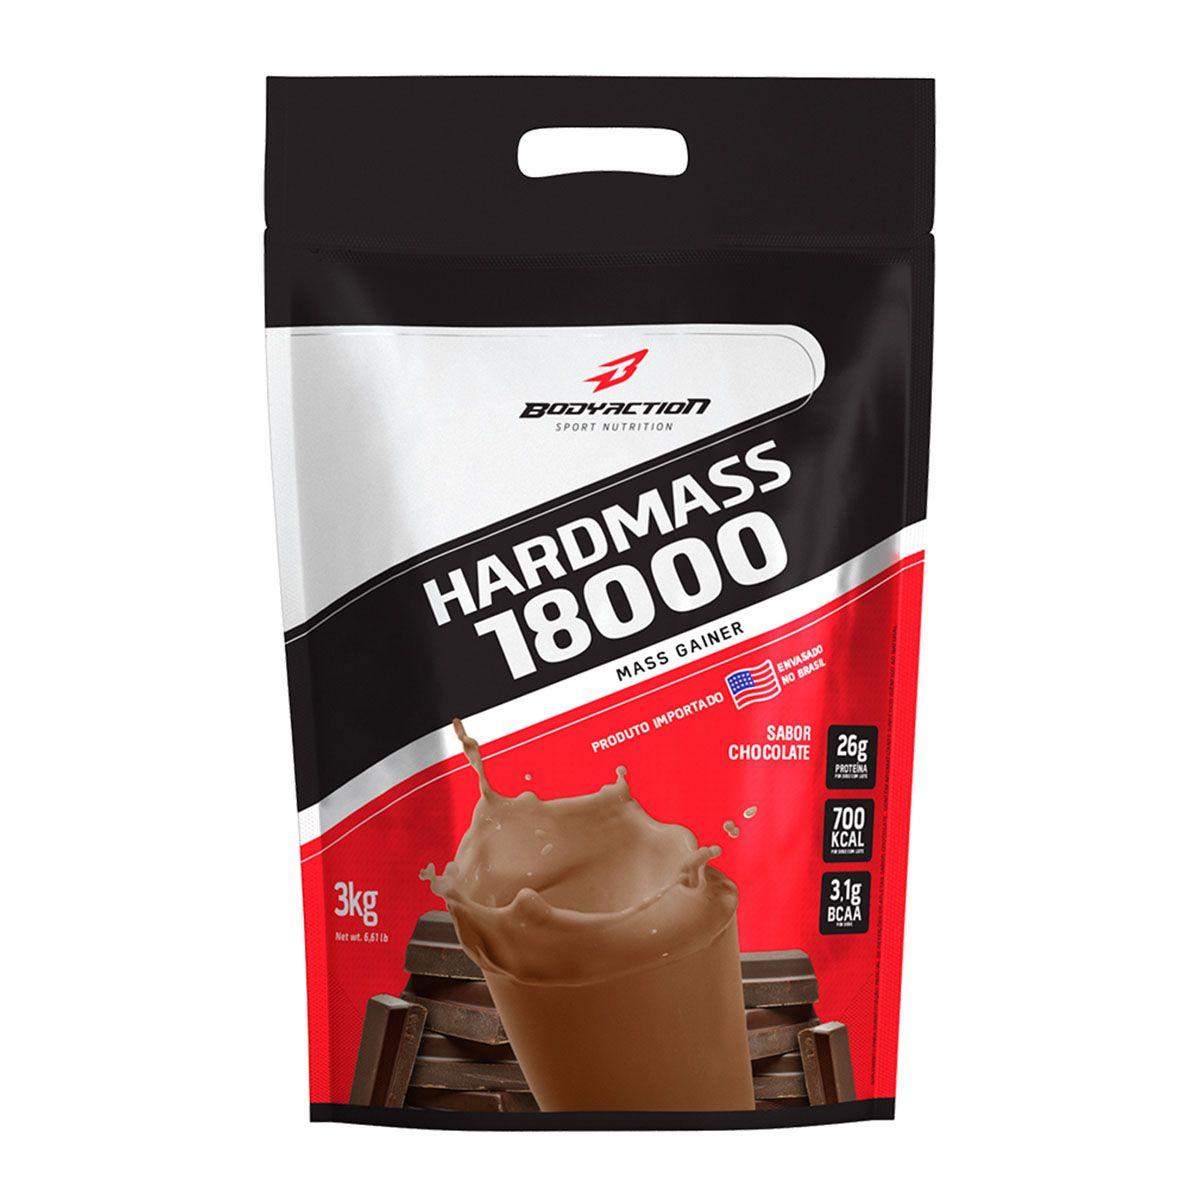 Hardmass 18000 3kg - Body Action